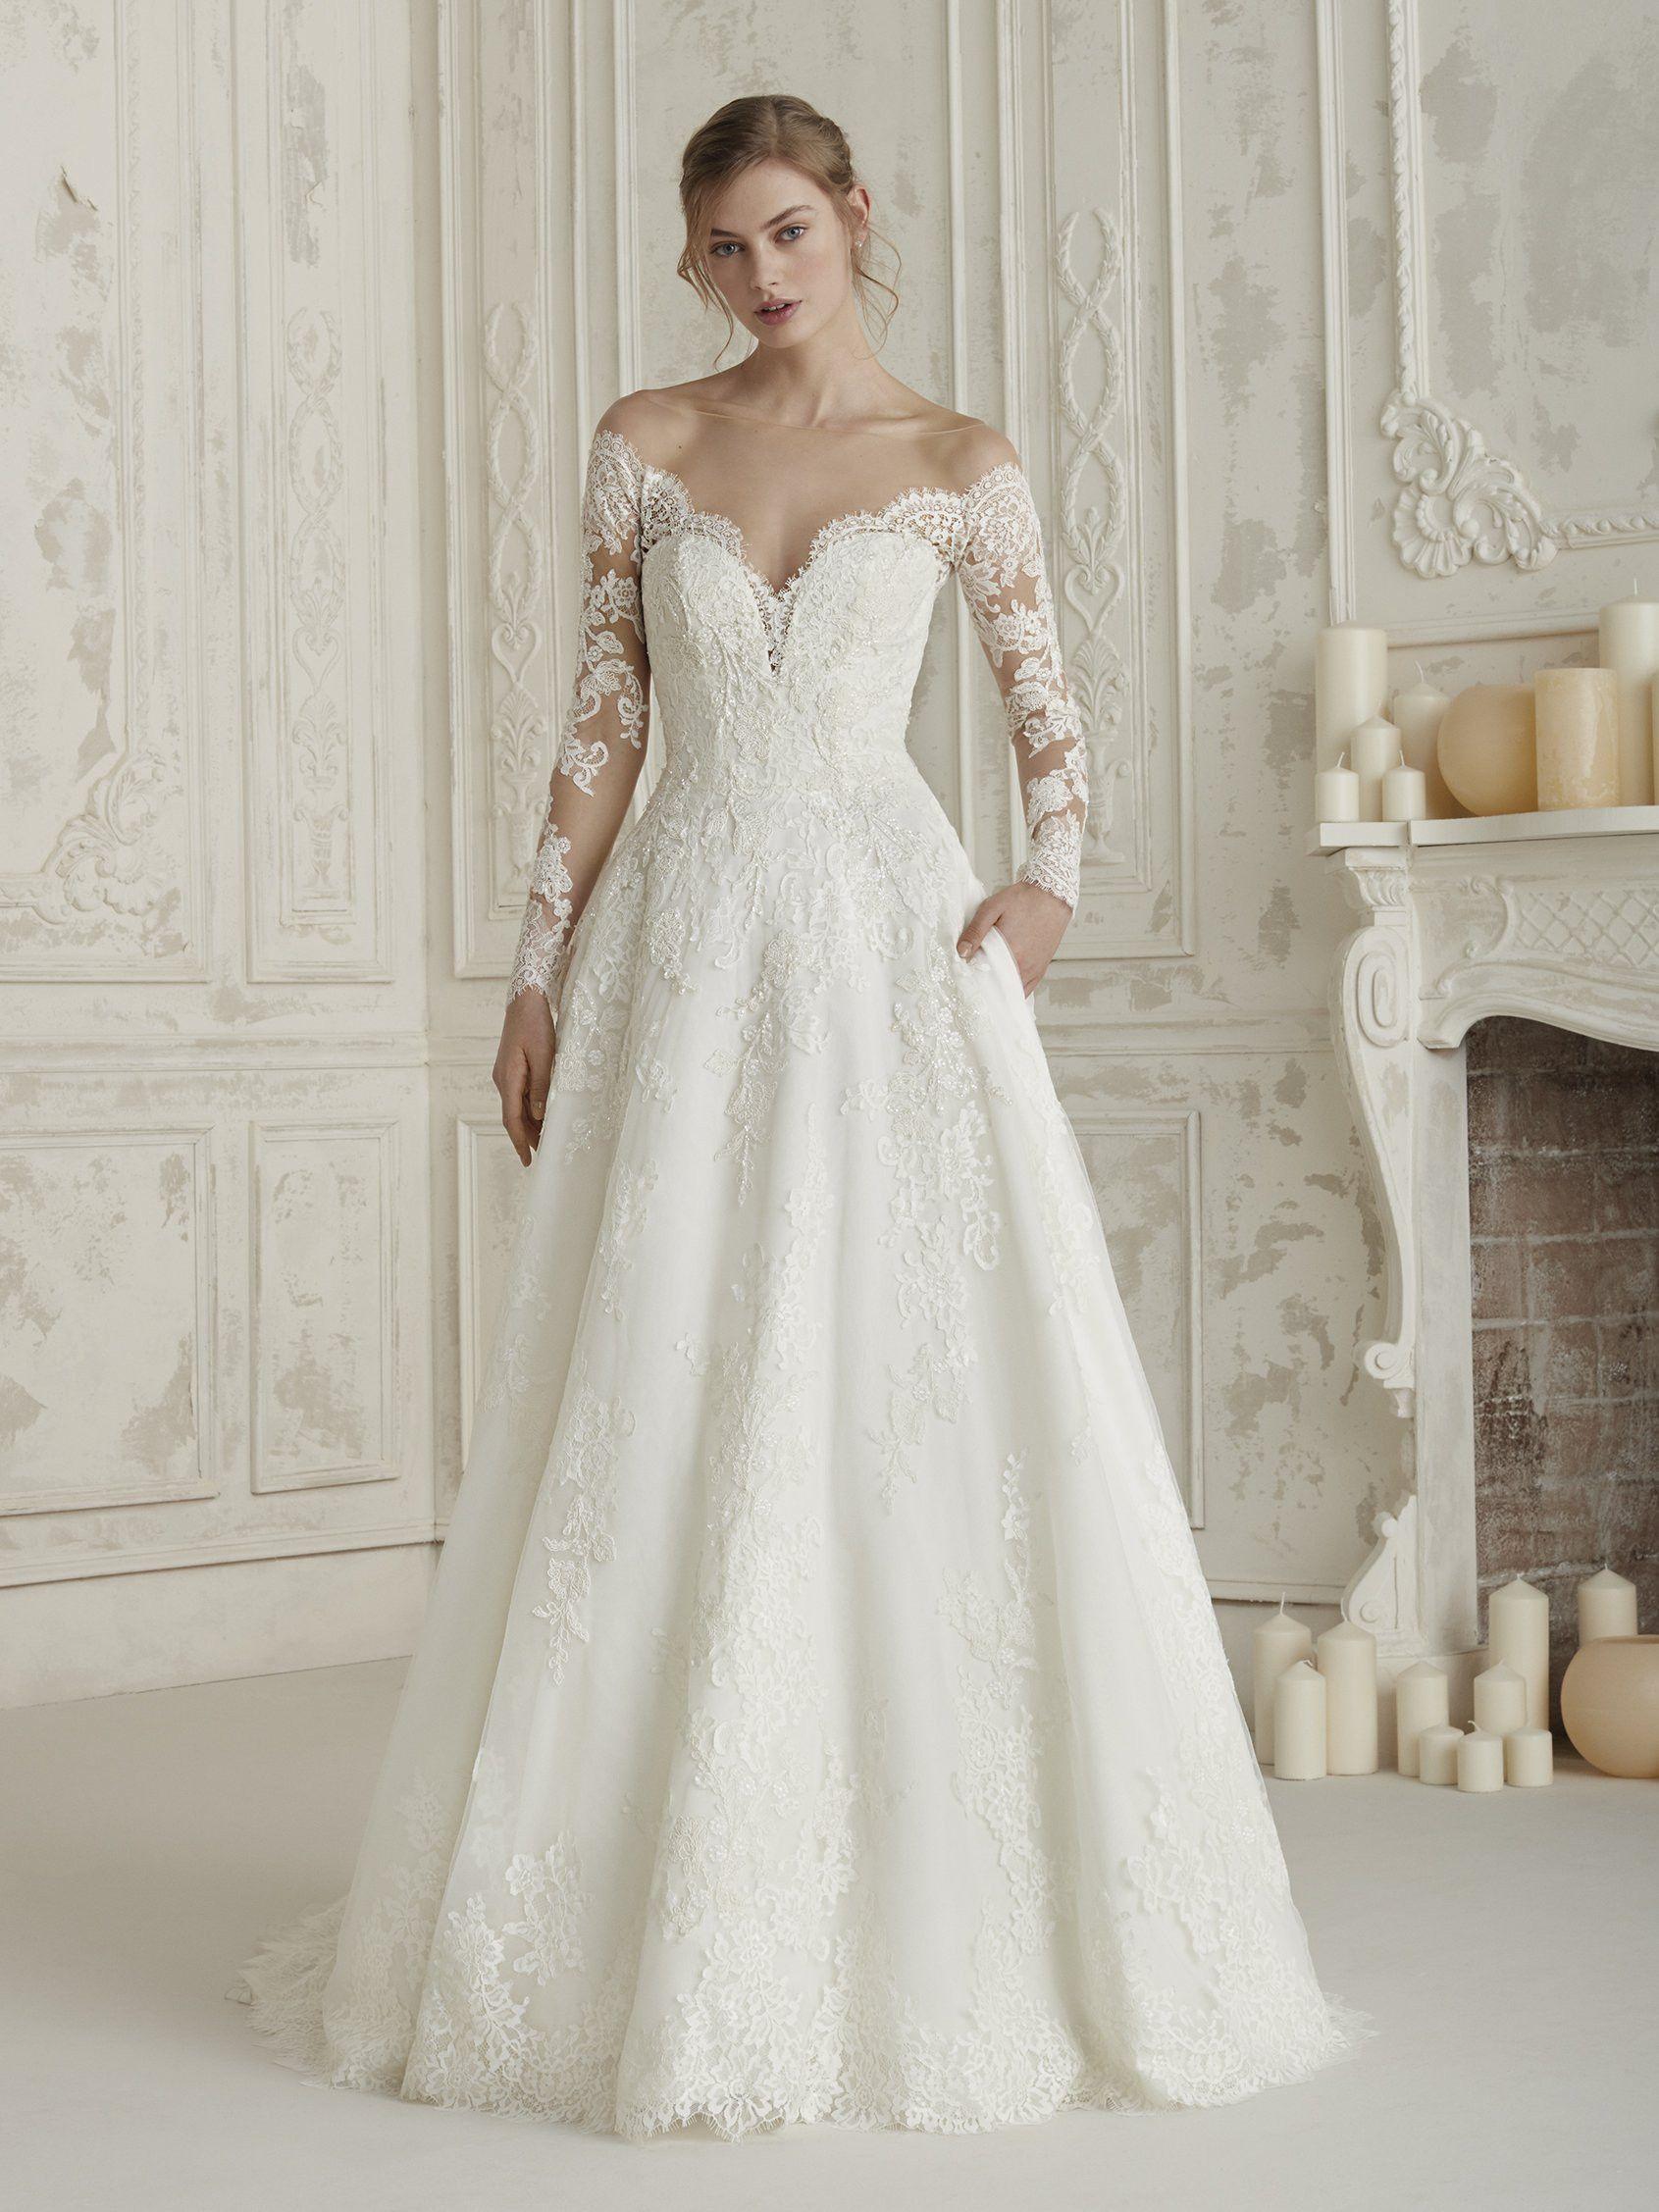 Try On Pronovias Dresses At Elegance By Roya Bridal Boutique Tysons Corner Va For More Information Bridal Dresses Wedding Dress Long Sleeve Wedding Dresses